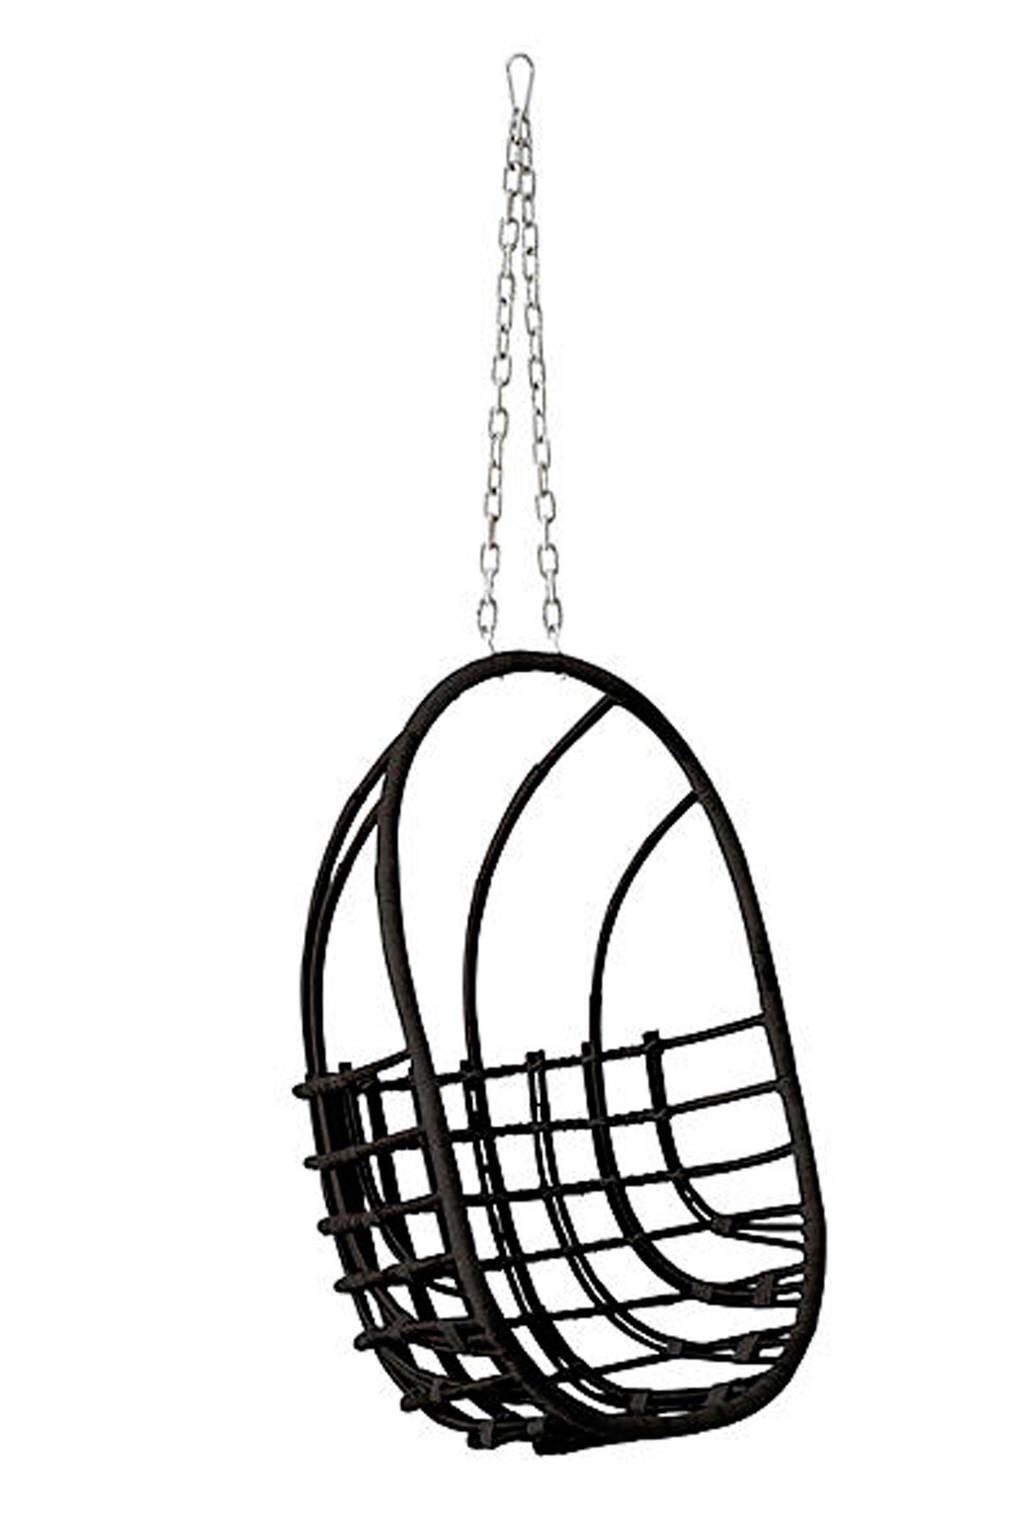 Rotan Hangstoel Wehkamp.Egg Chair Hangstoel